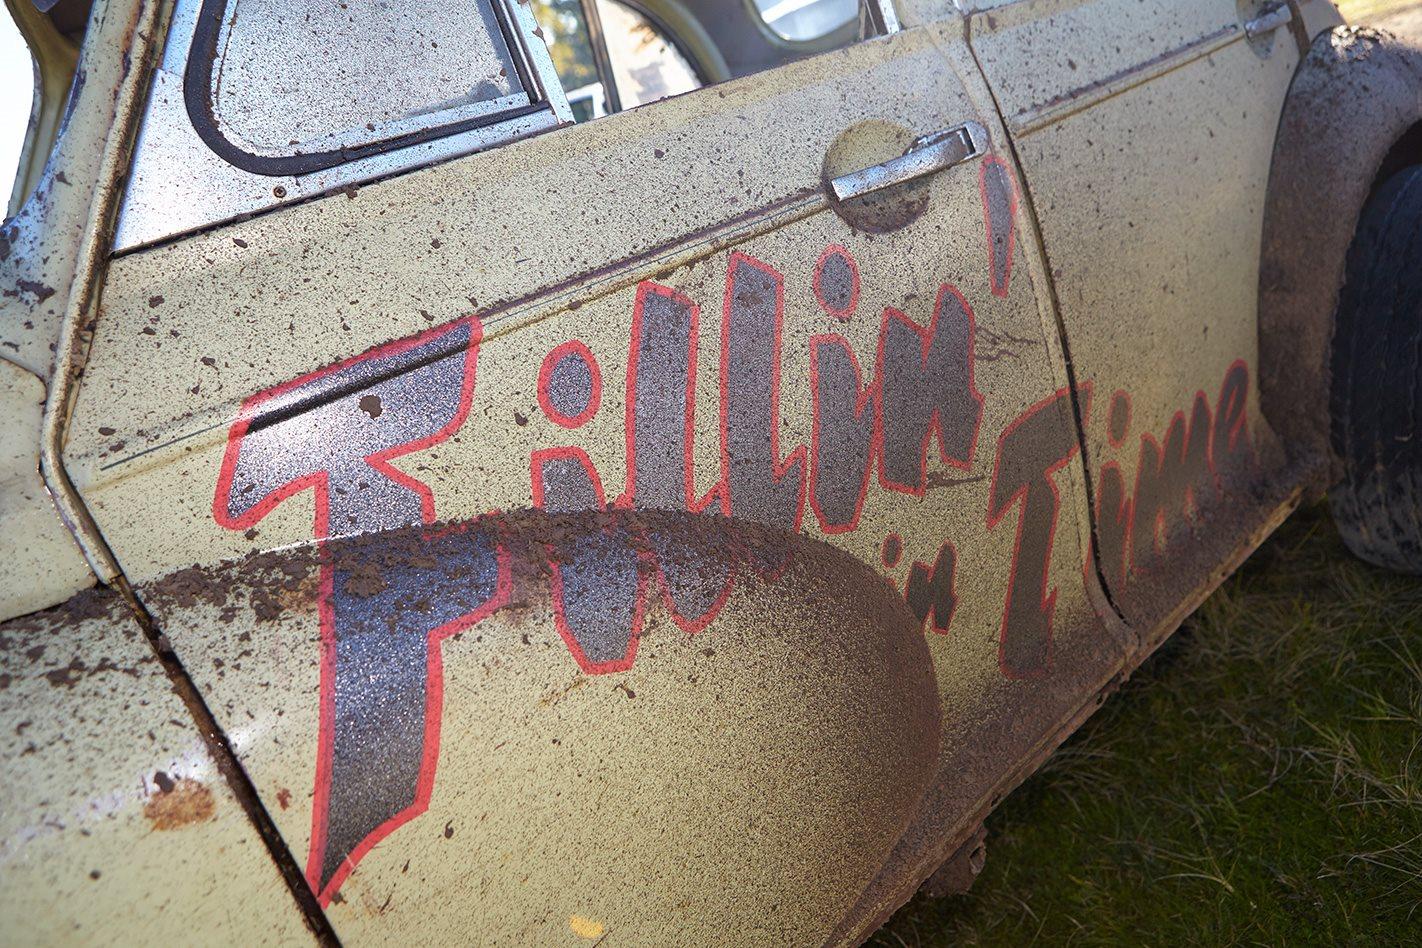 V8 MORRIS MINOR paint